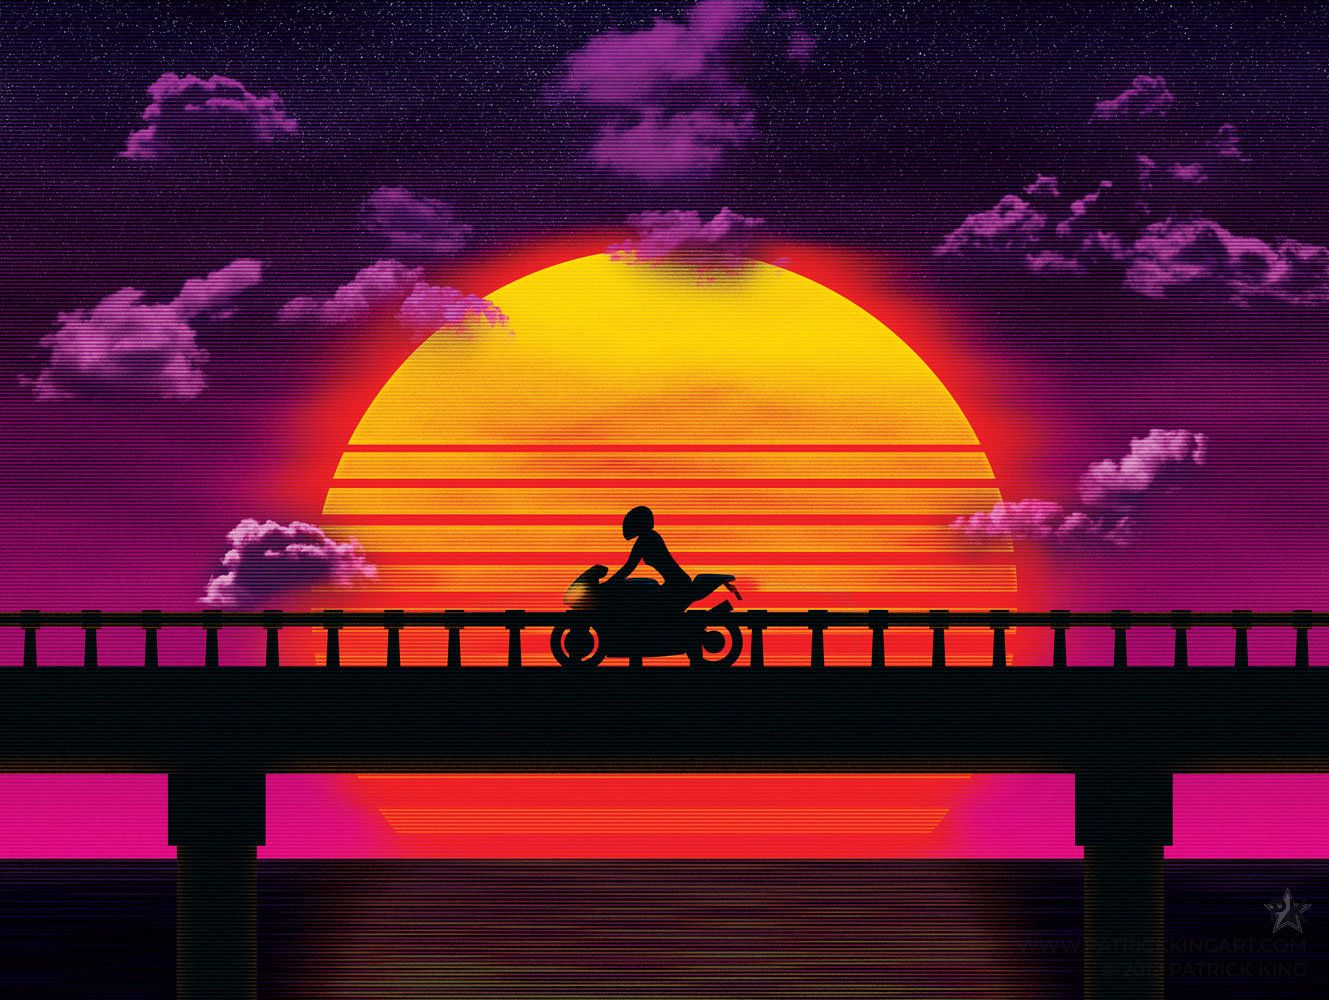 Causeway Bike Sticker Synthwave Vaporwave Outrun 80s Etsy Sy